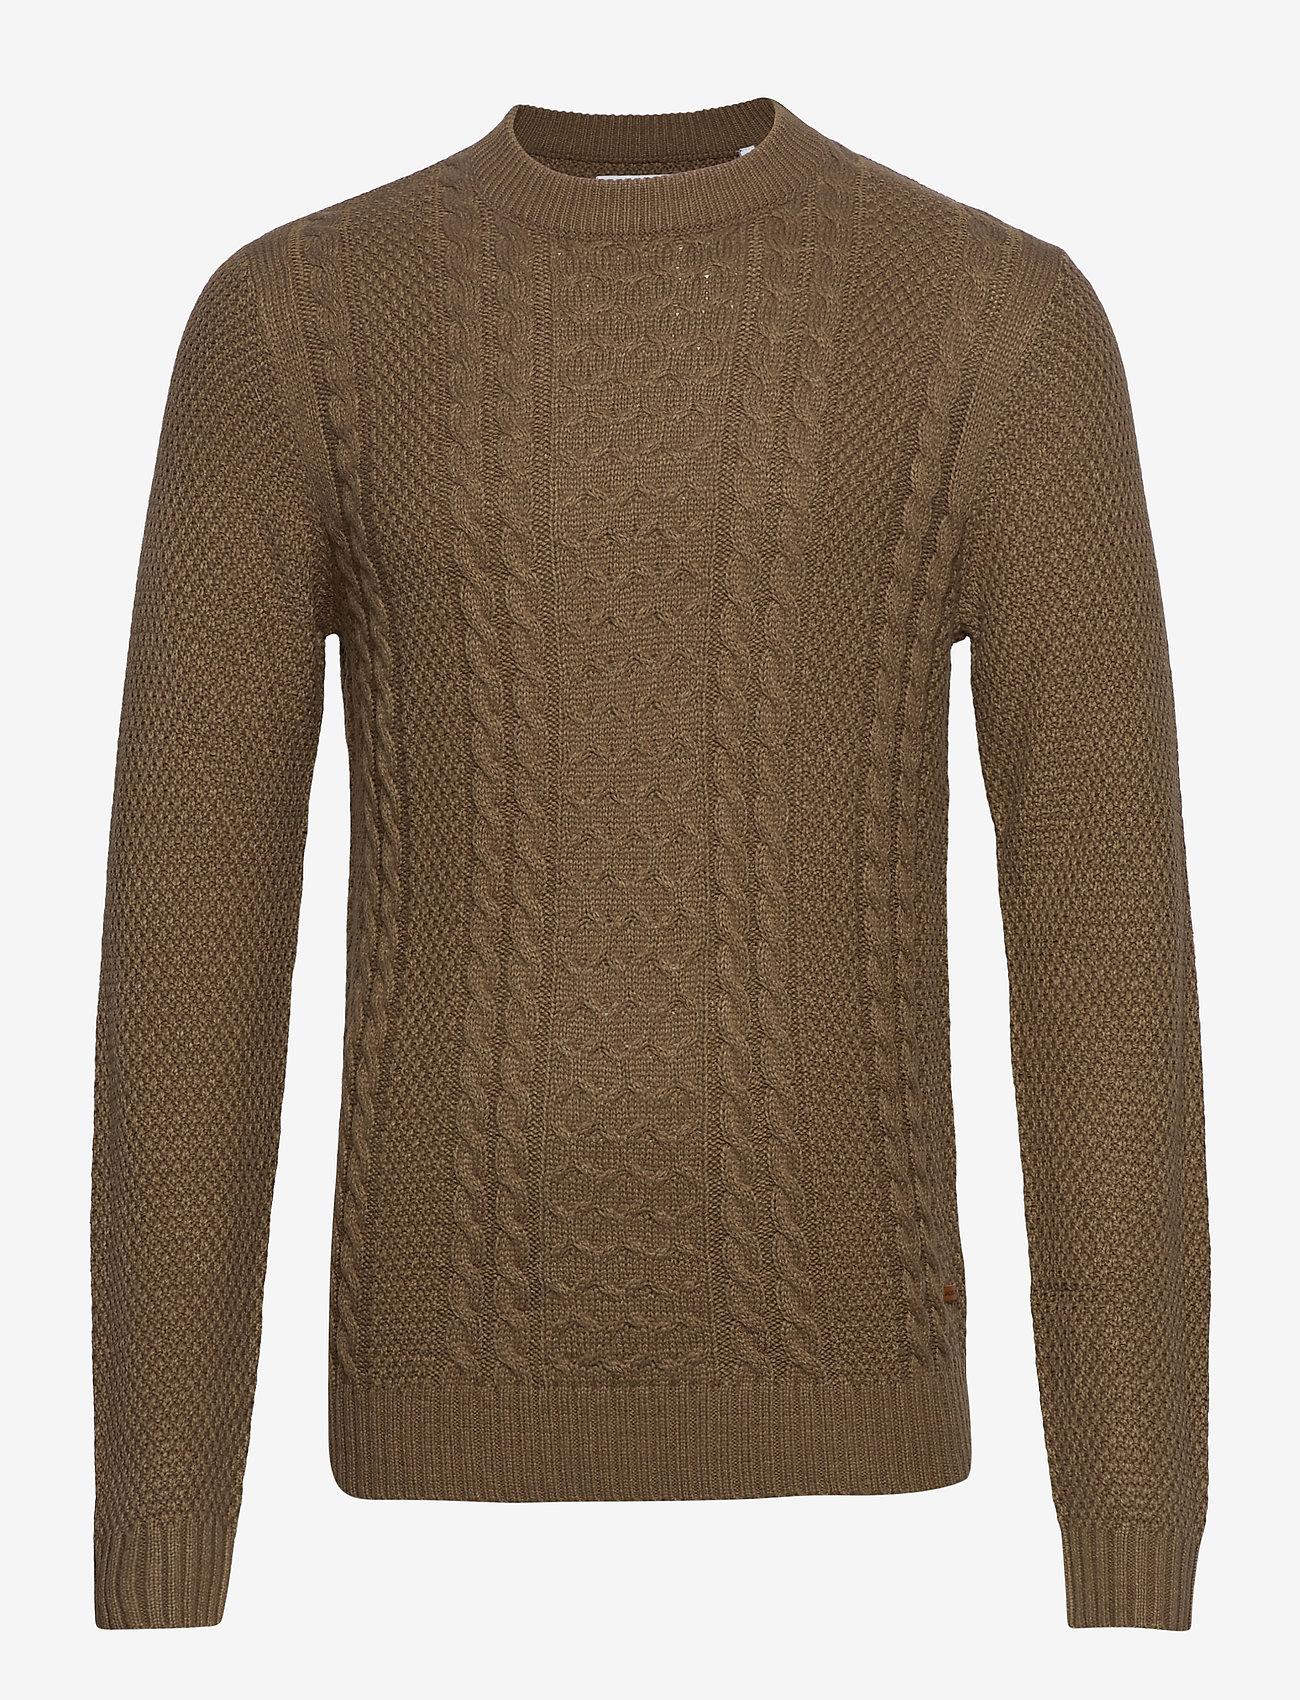 Jack & Jones - JJKIM KNIT CREW NECK - tricots basiques - sepia tint - 0